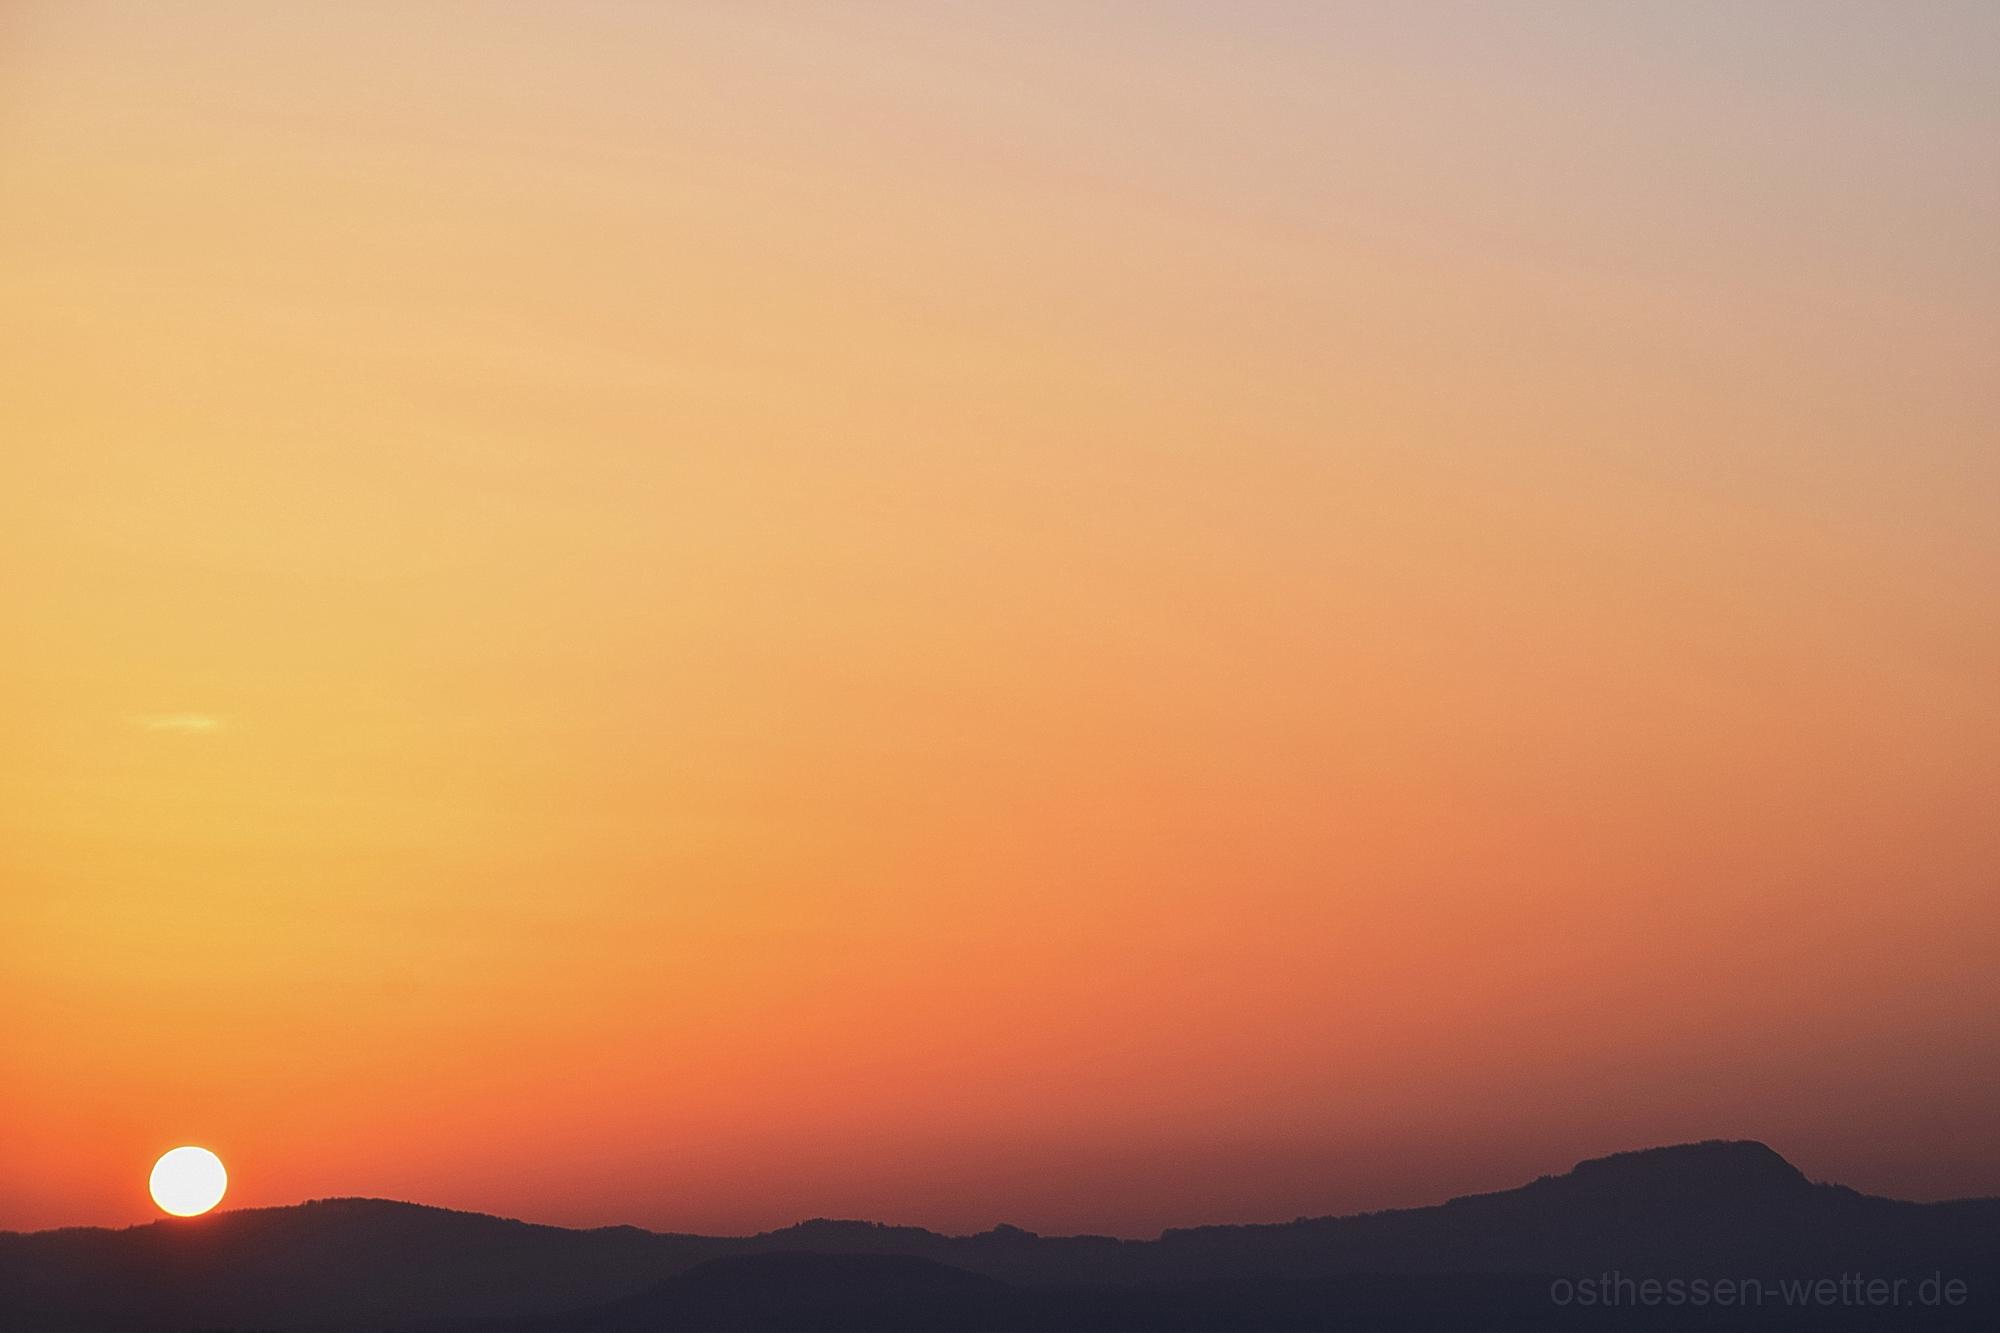 Sonnenaufgang am 28.03.2020 um 06:16:37 CET